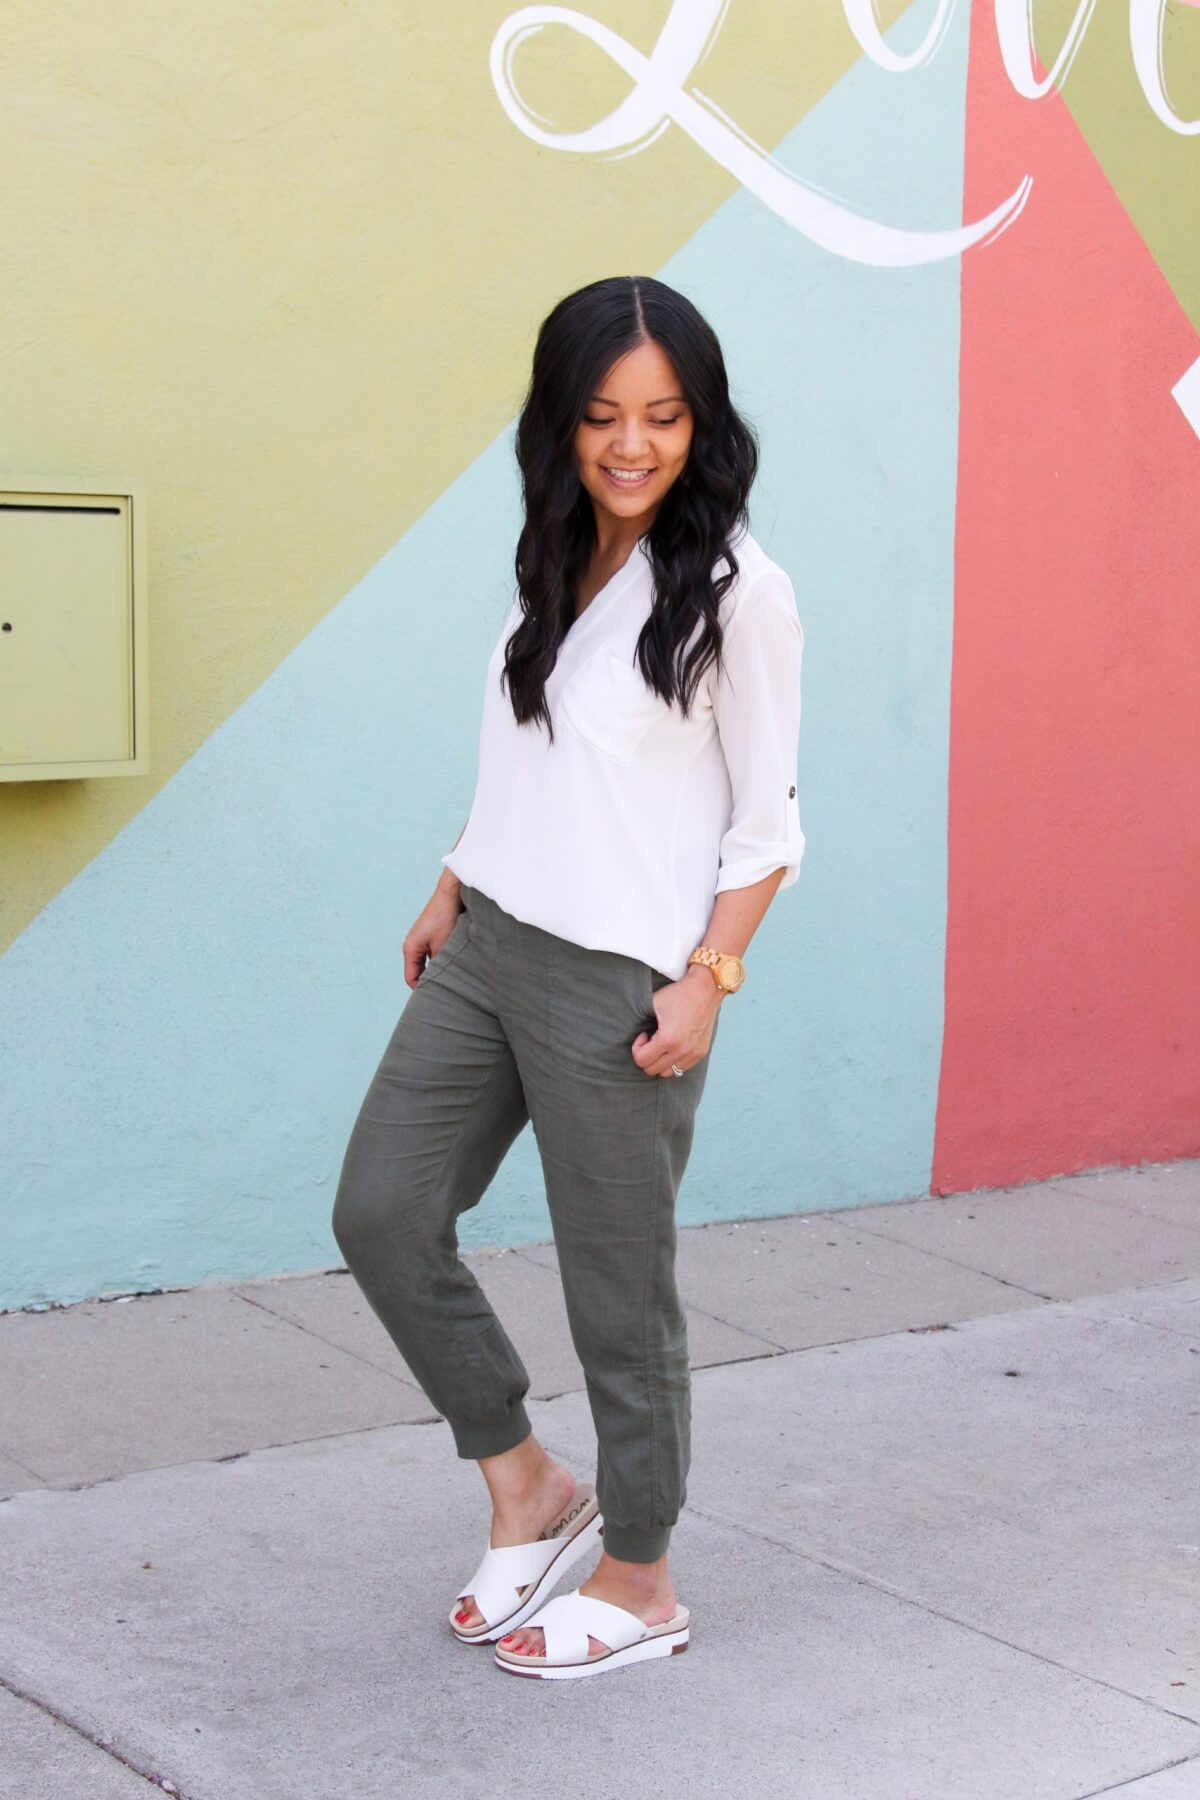 Summer Linen Pants Outfit: olive linen joggers + white v-neck tunic + tan crossbody bag + white slide sandals + tan leather earrings